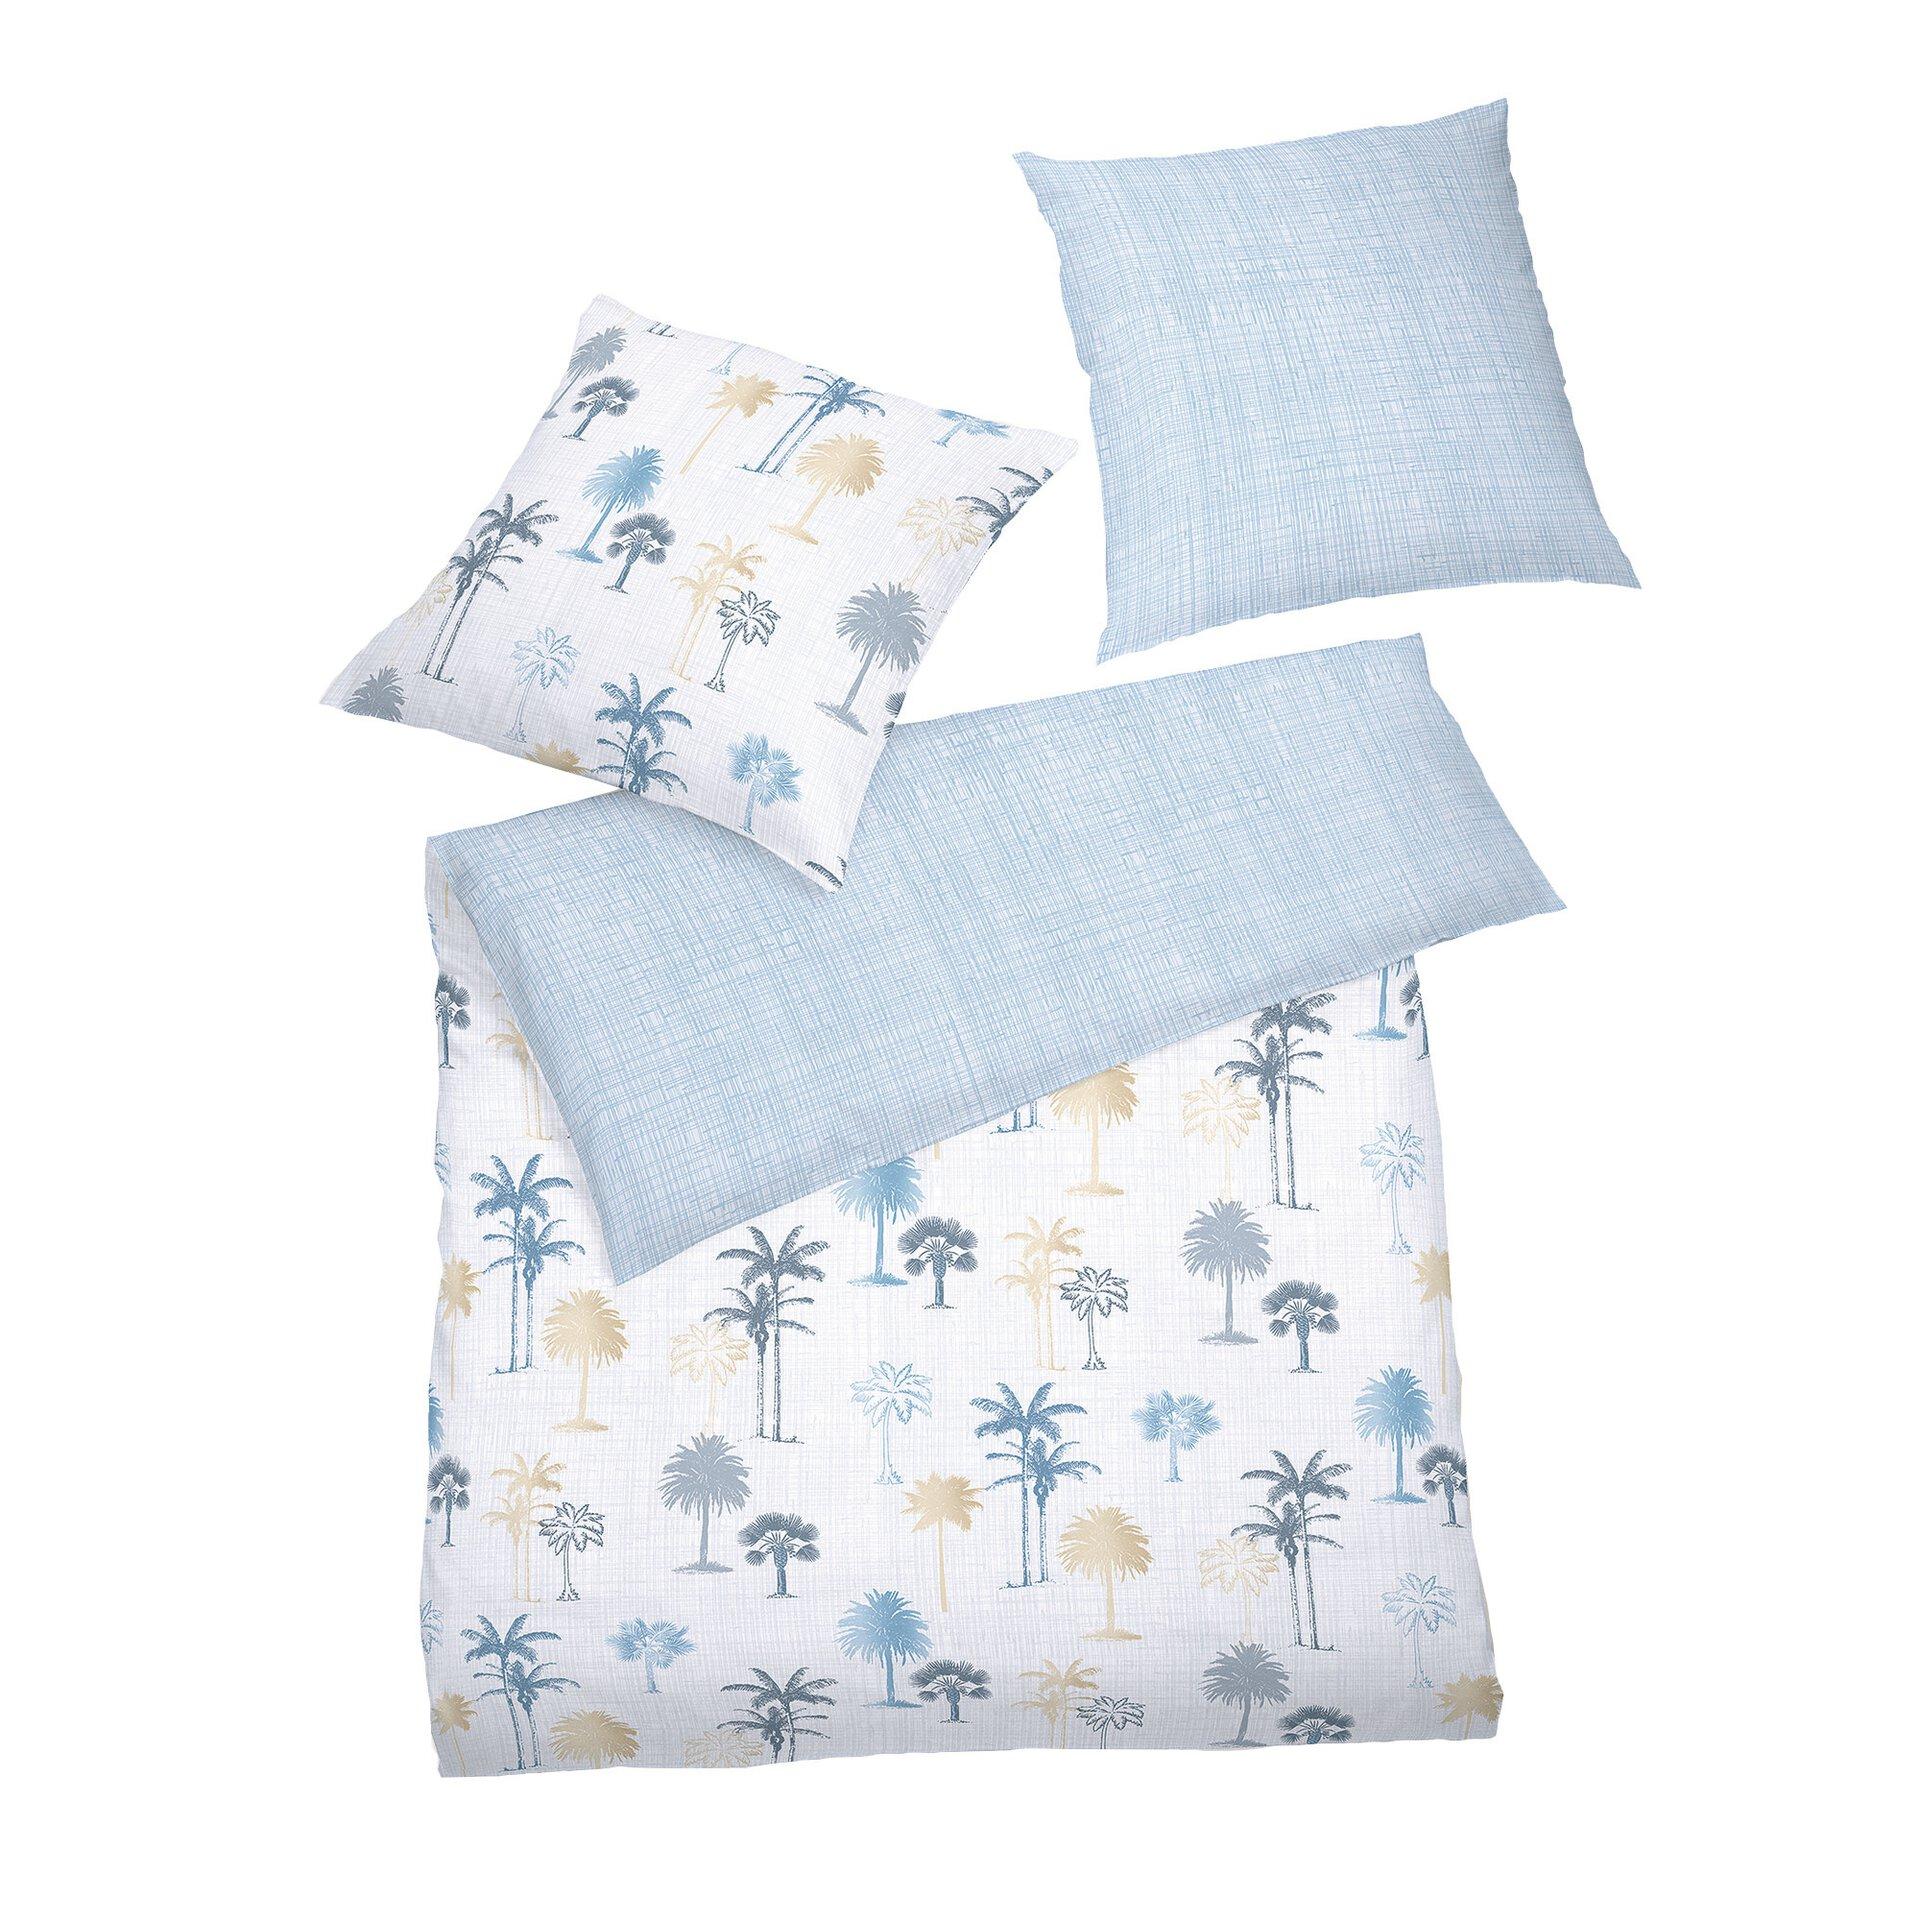 Satin-Bettwäsche Mako Satin select Schlafgut Textil Blau 135 x 200 cm